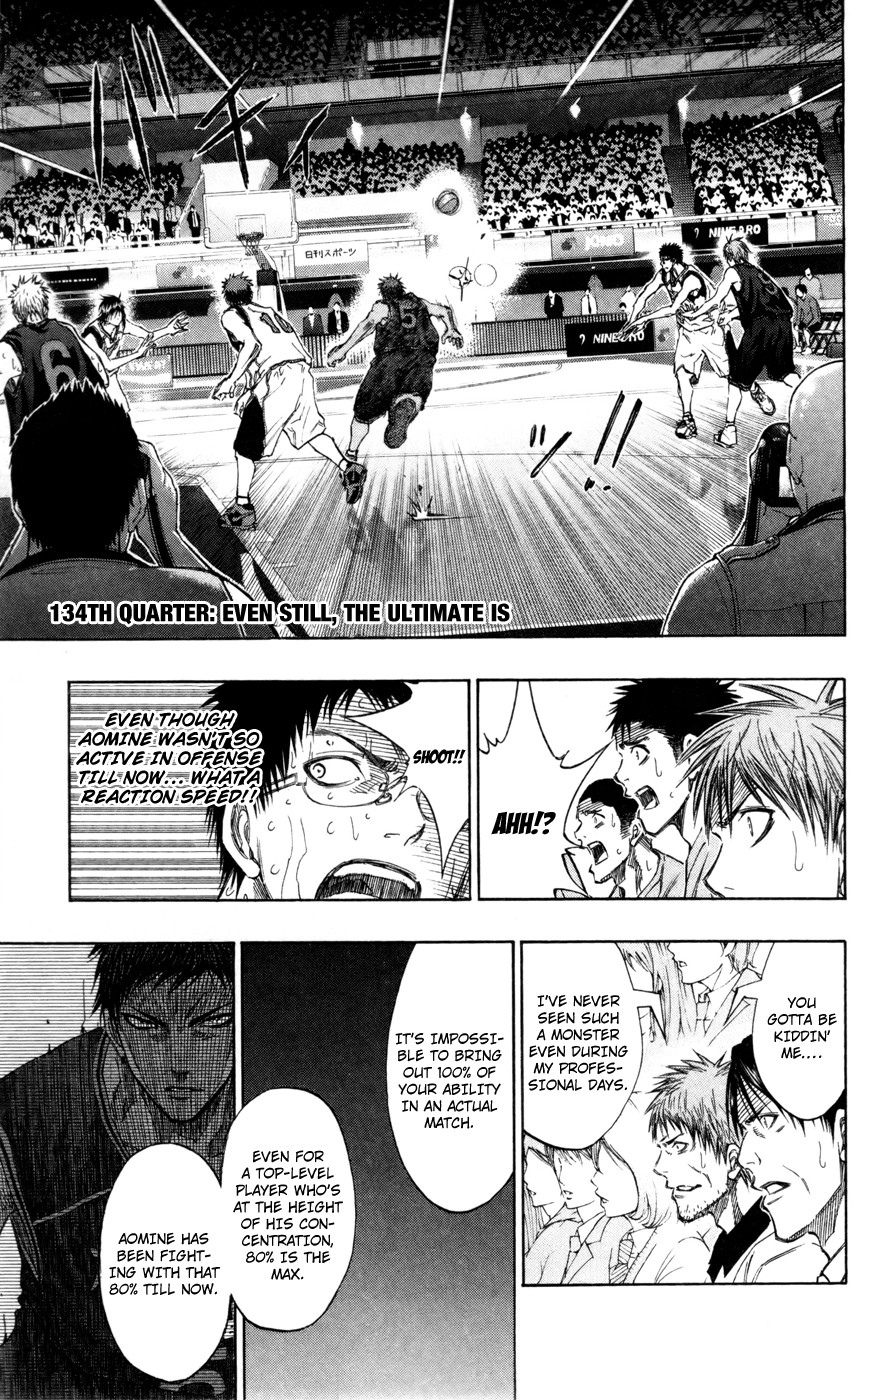 Kuroko no Basket Manga Chapter 134 - Image 01